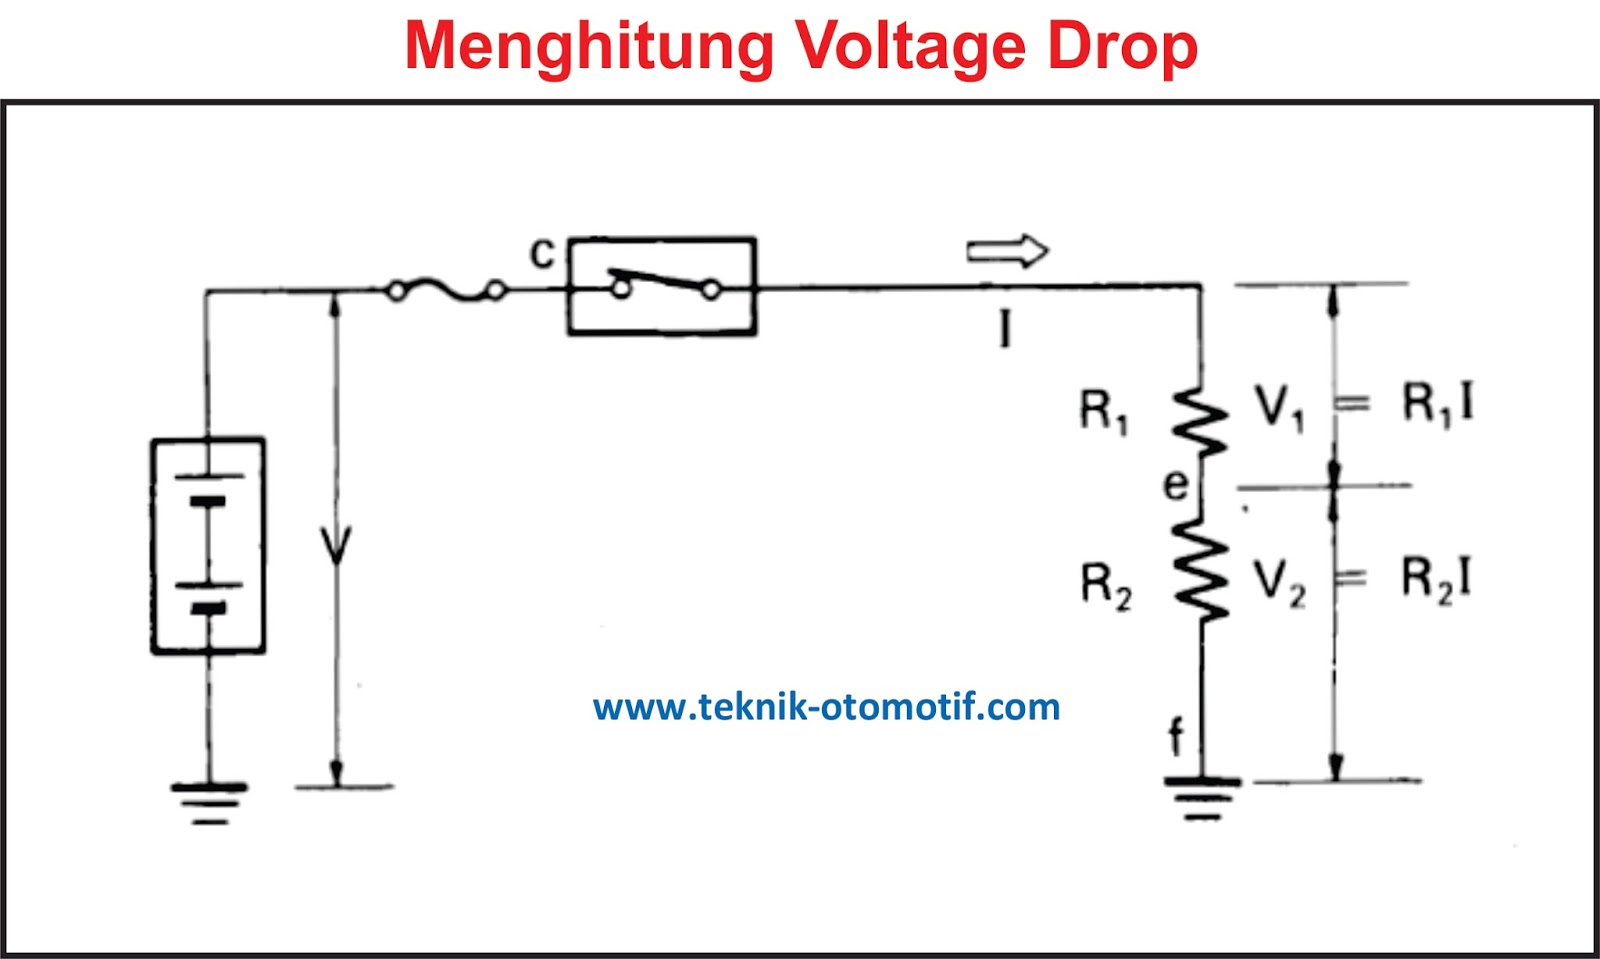 Pengertian Voltage Drop (Tegangan Jatuh) | teknik-otomotif.com